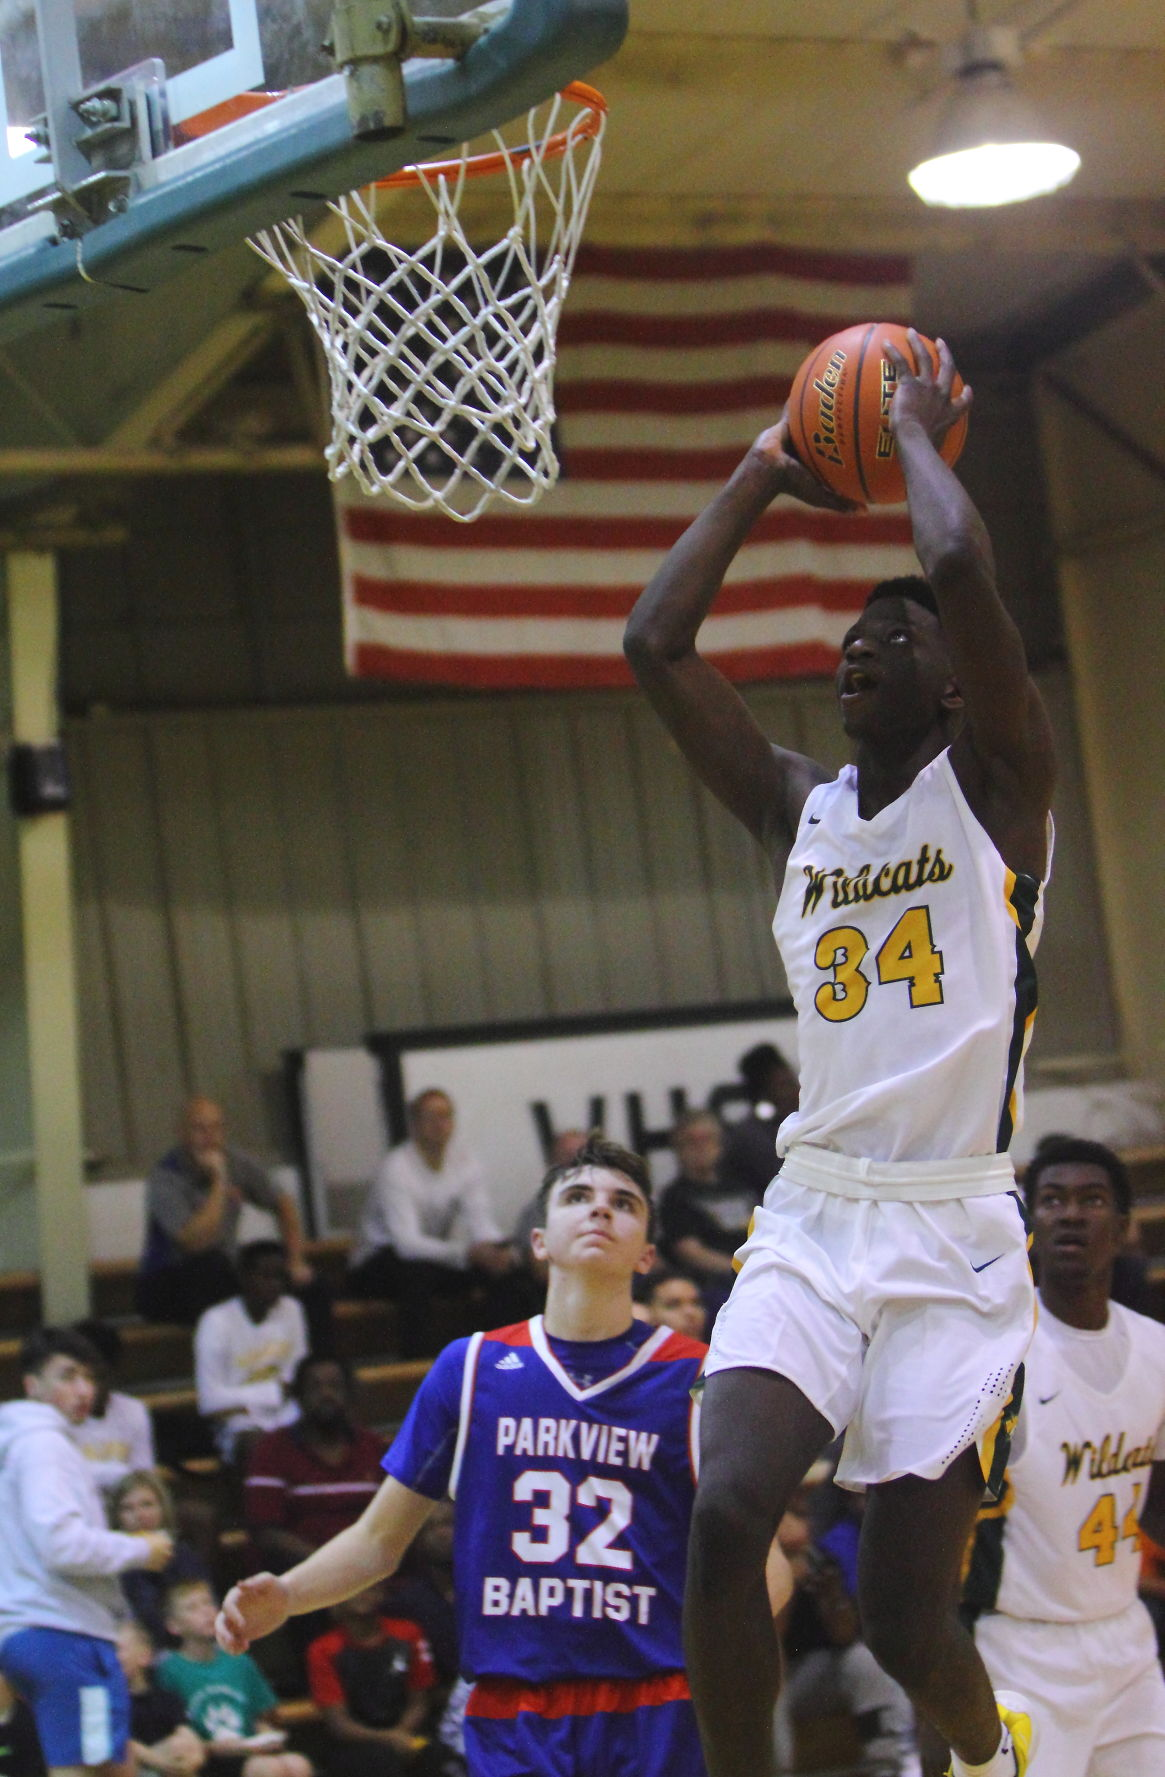 Walker \u0026 Parkview Basketball Brian Thomas